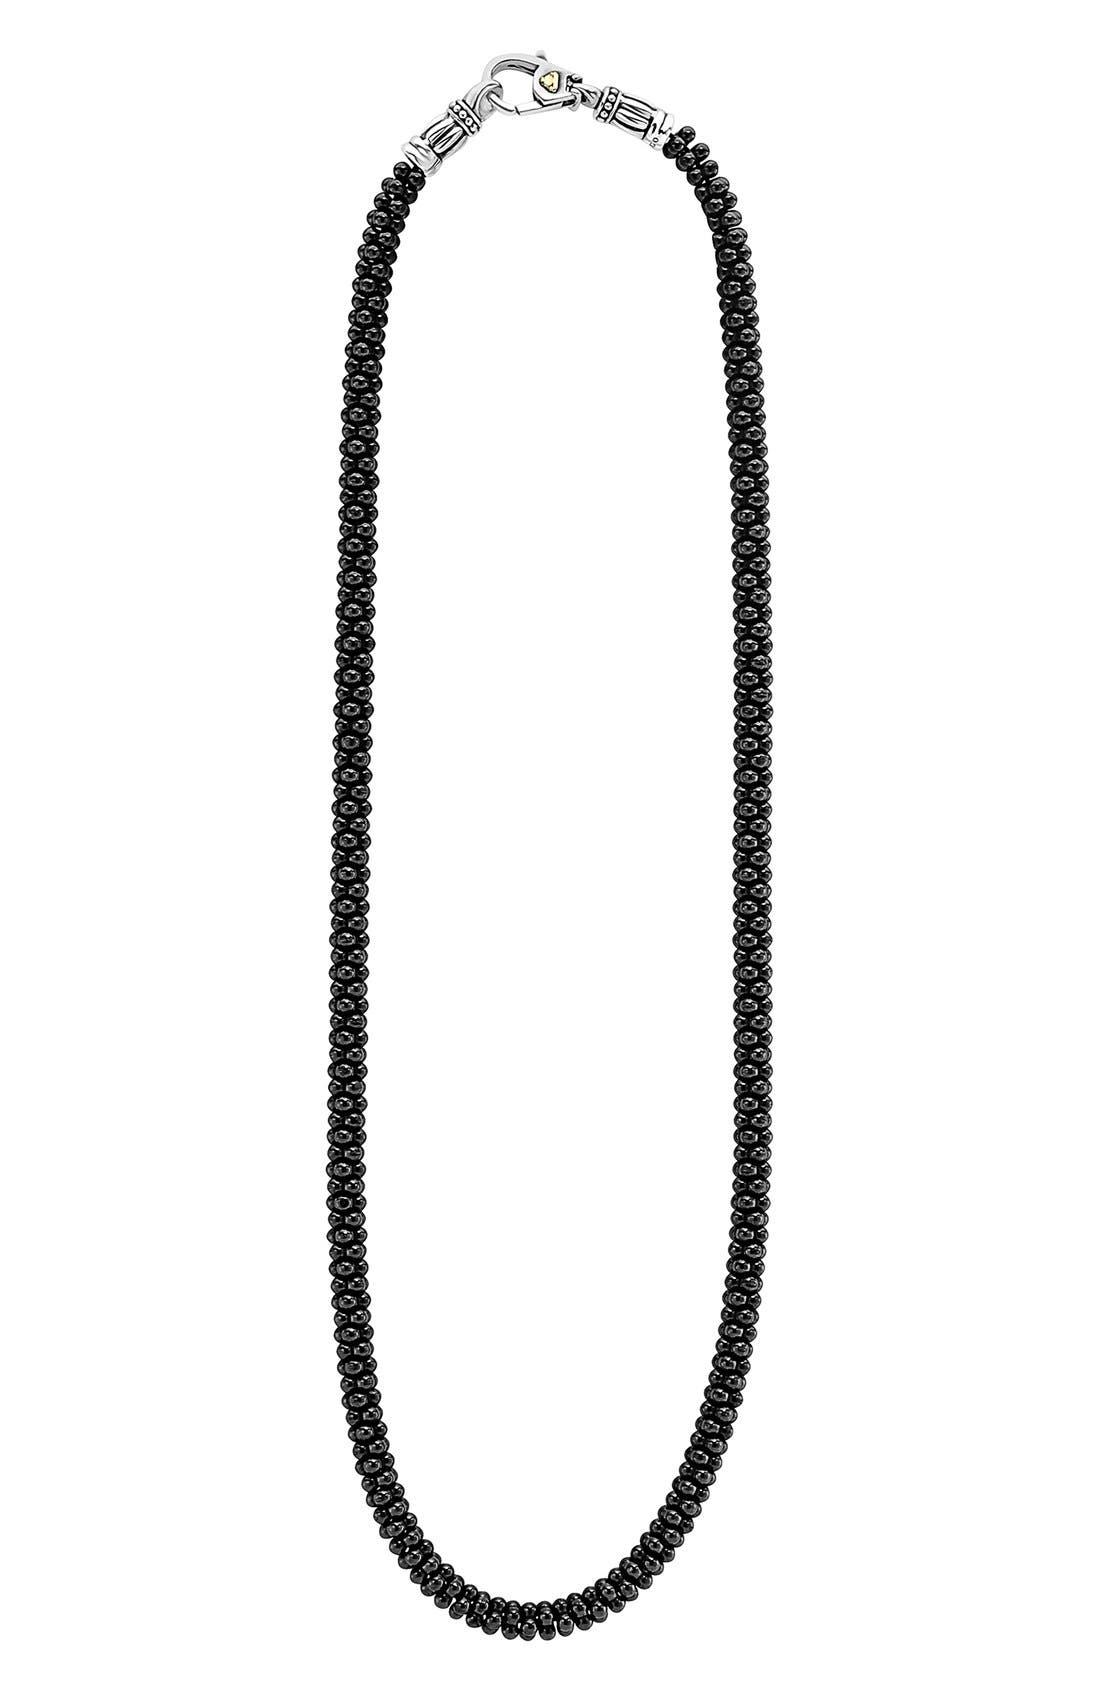 LAGOS 'Black Caviar' 5mm Beaded Necklace